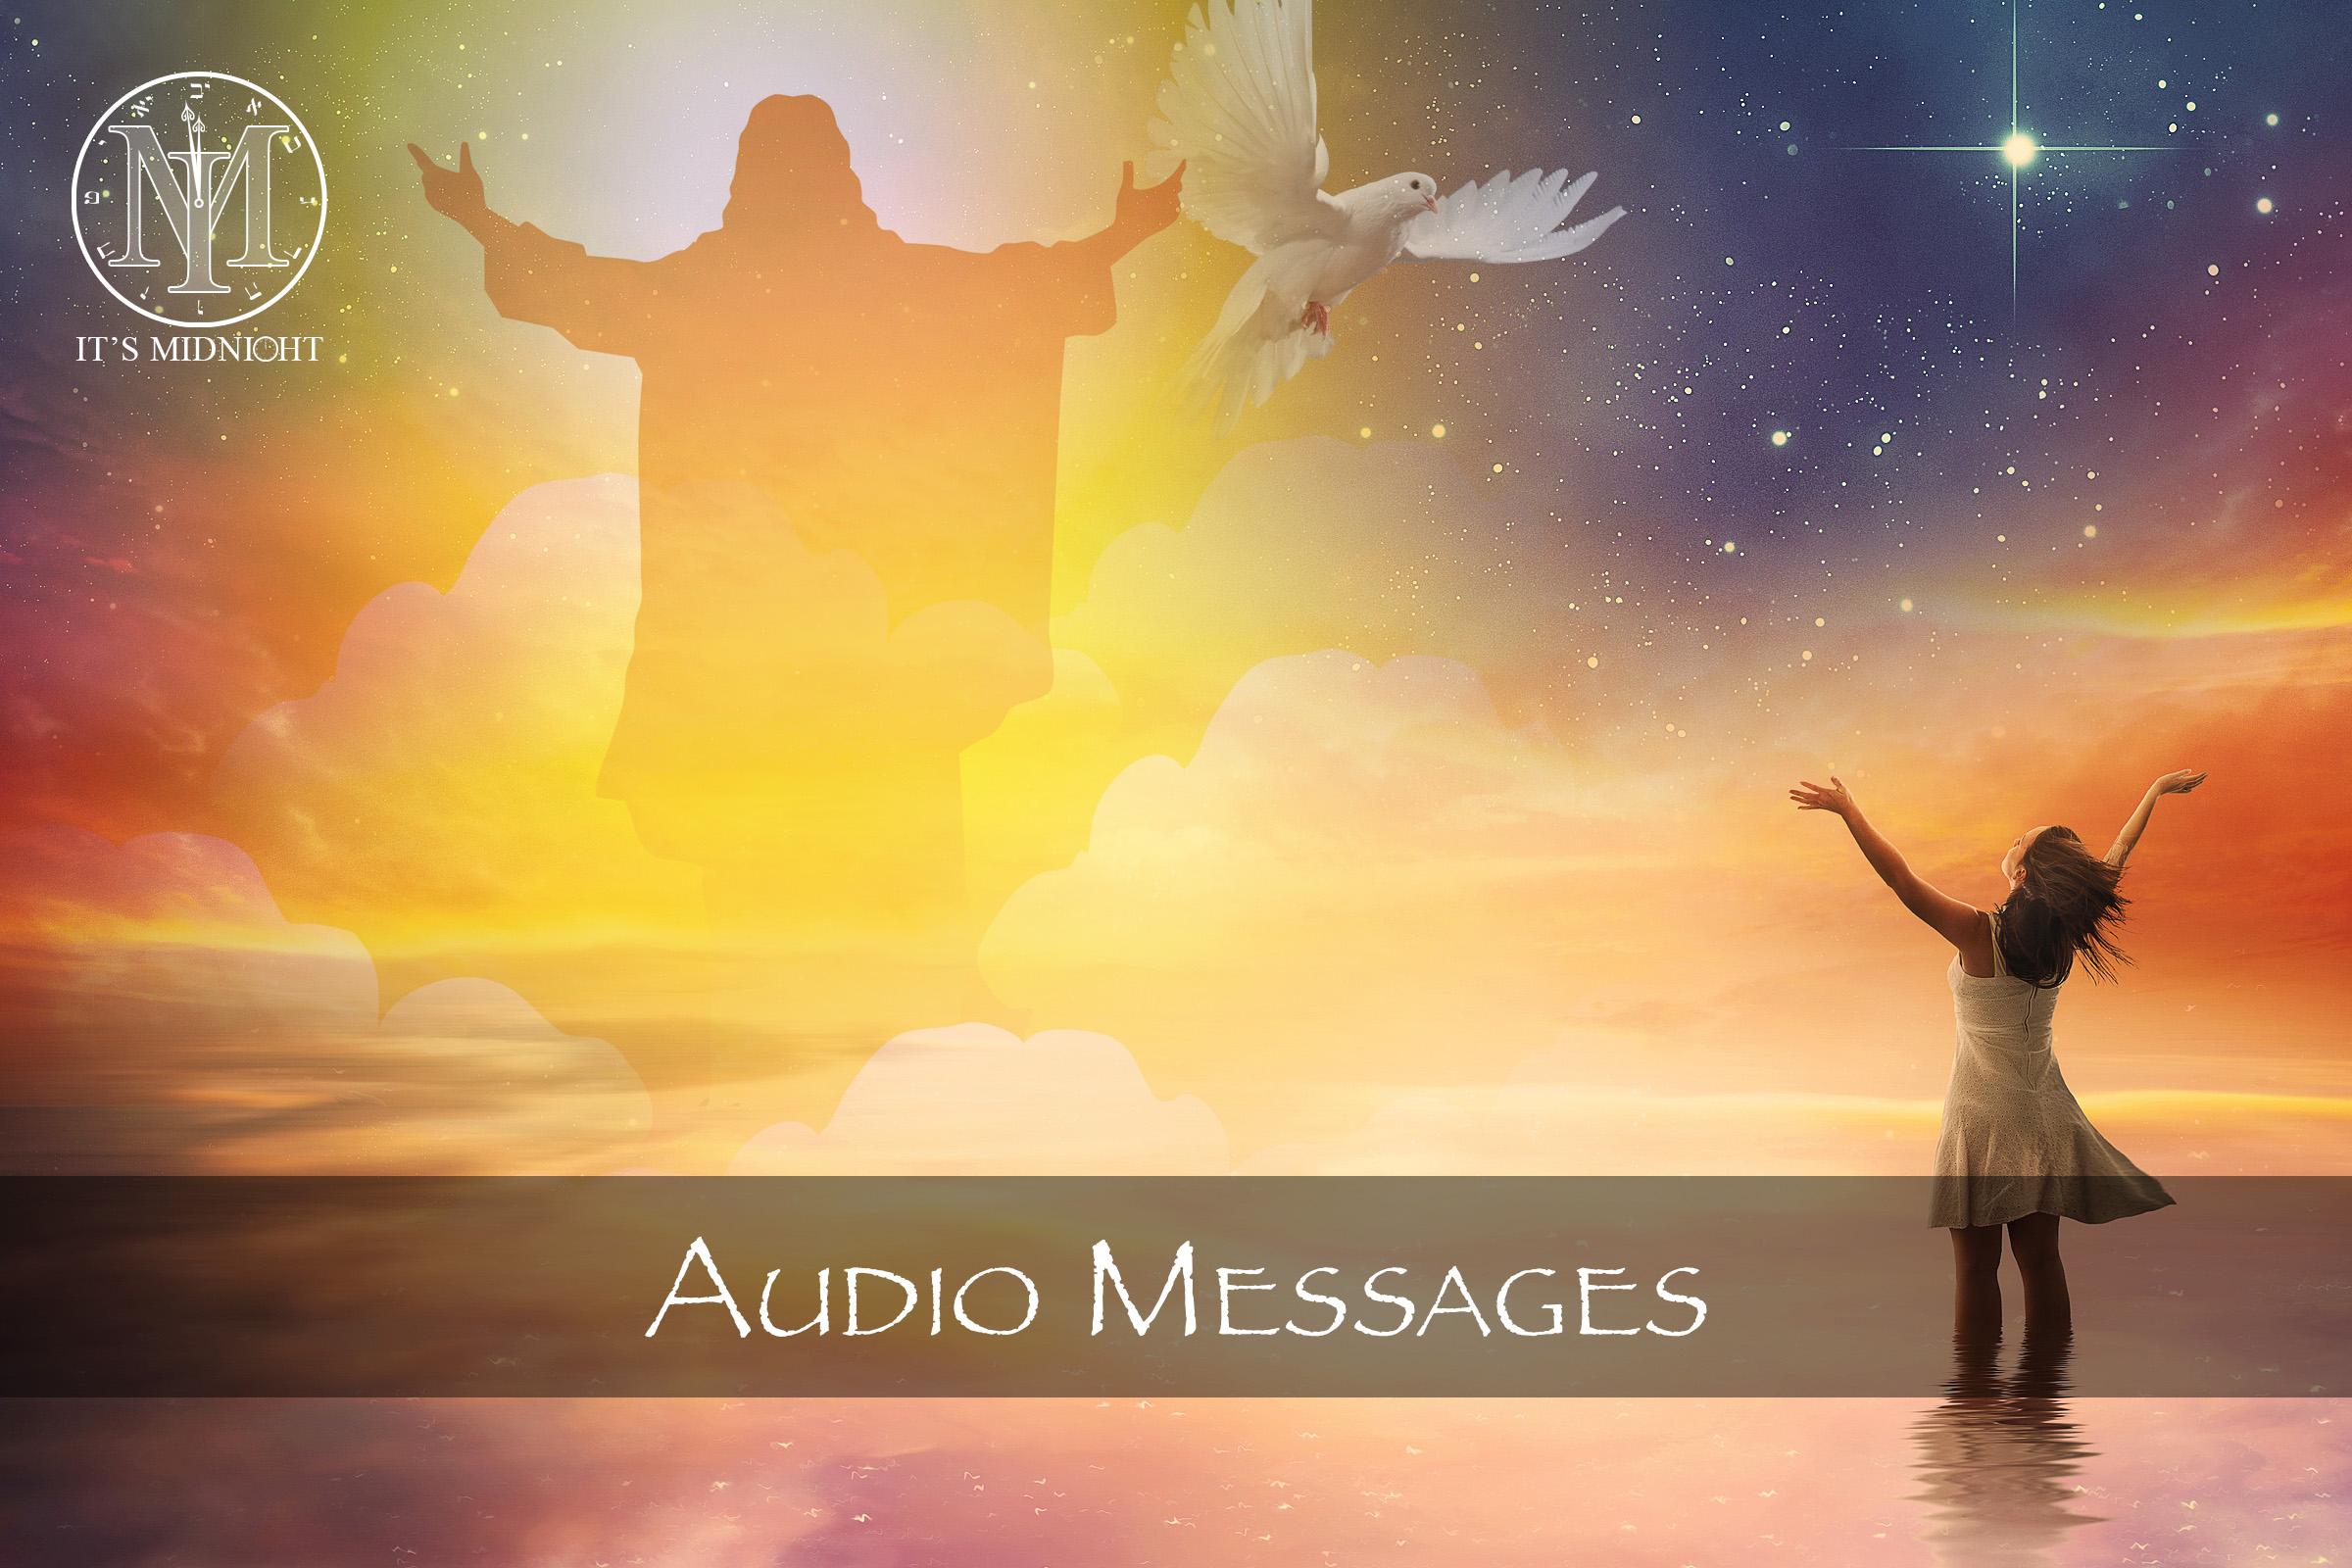 Audio Messages Thumbnail.jpg